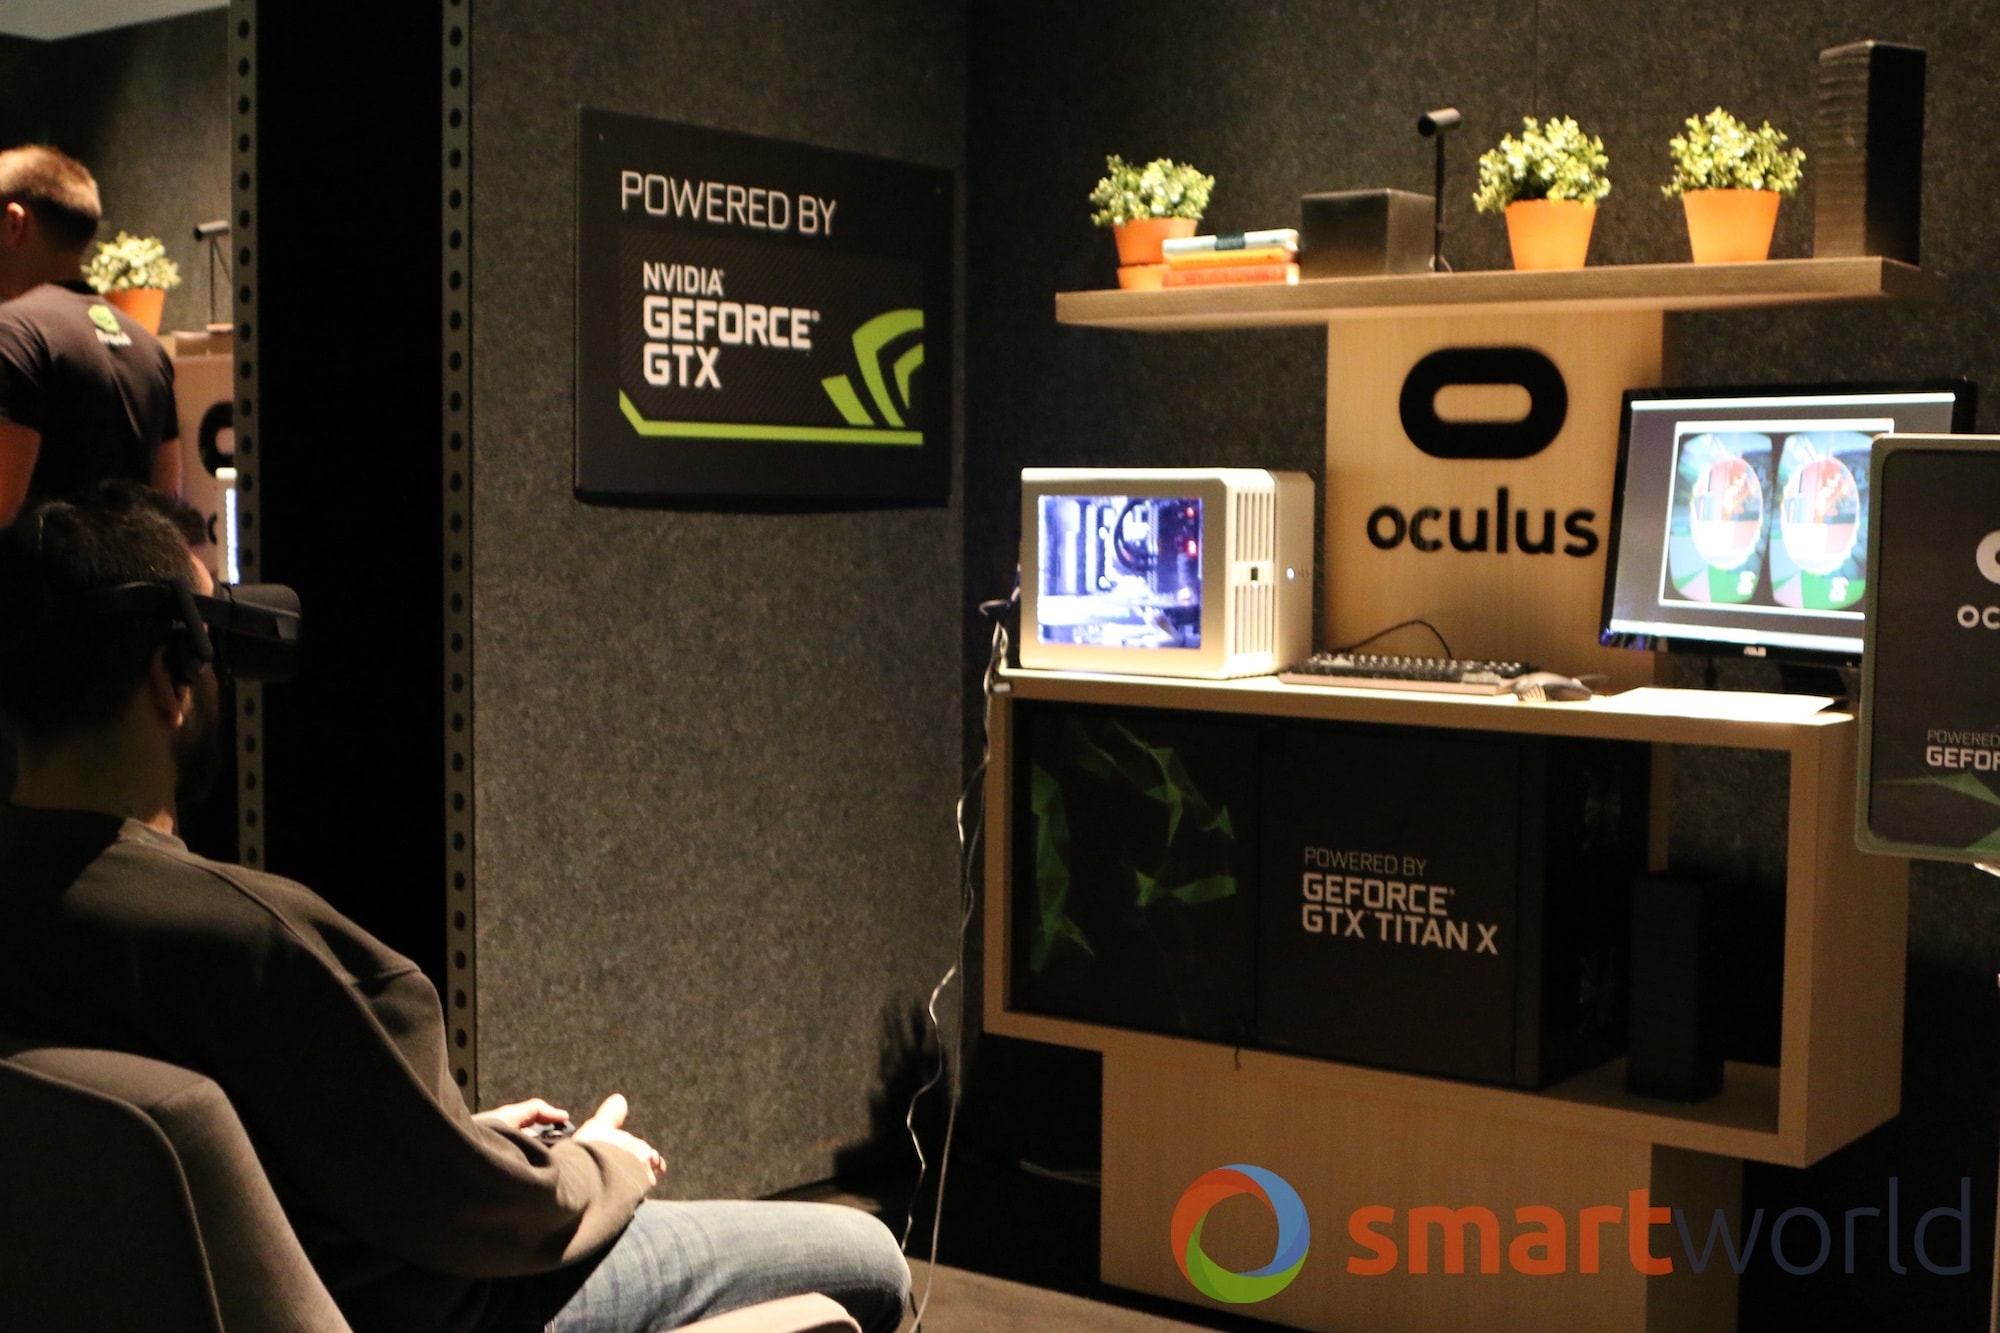 NVIDIA Vive Oculus – 7